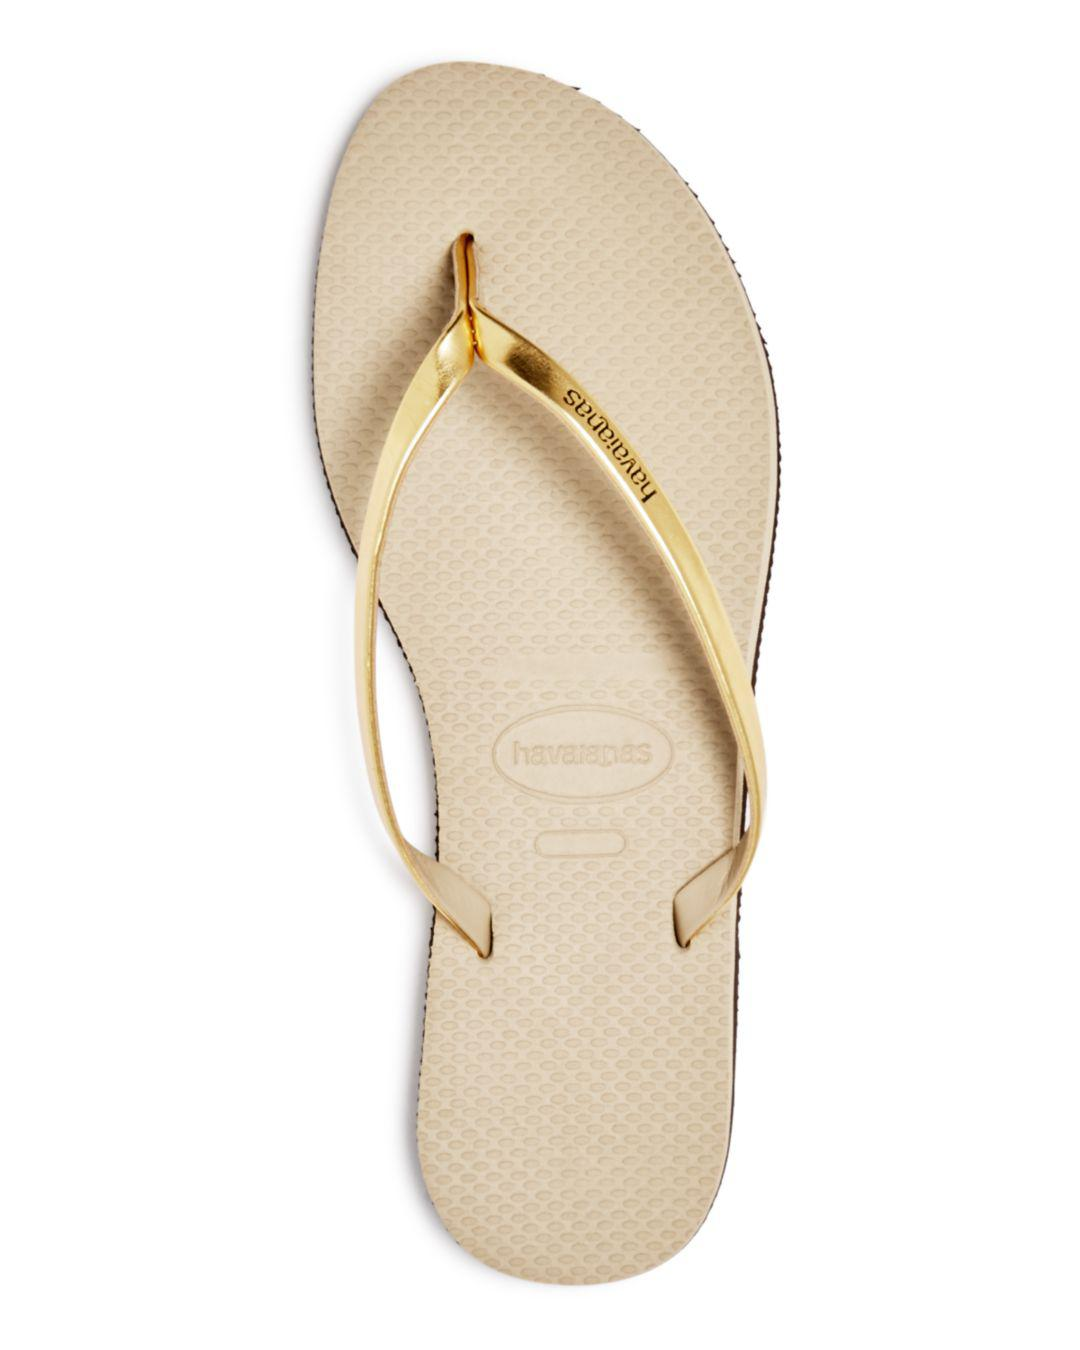 92dadf7c615 Lyst - Havaianas You Metallic Slim Flip-flops in Natural